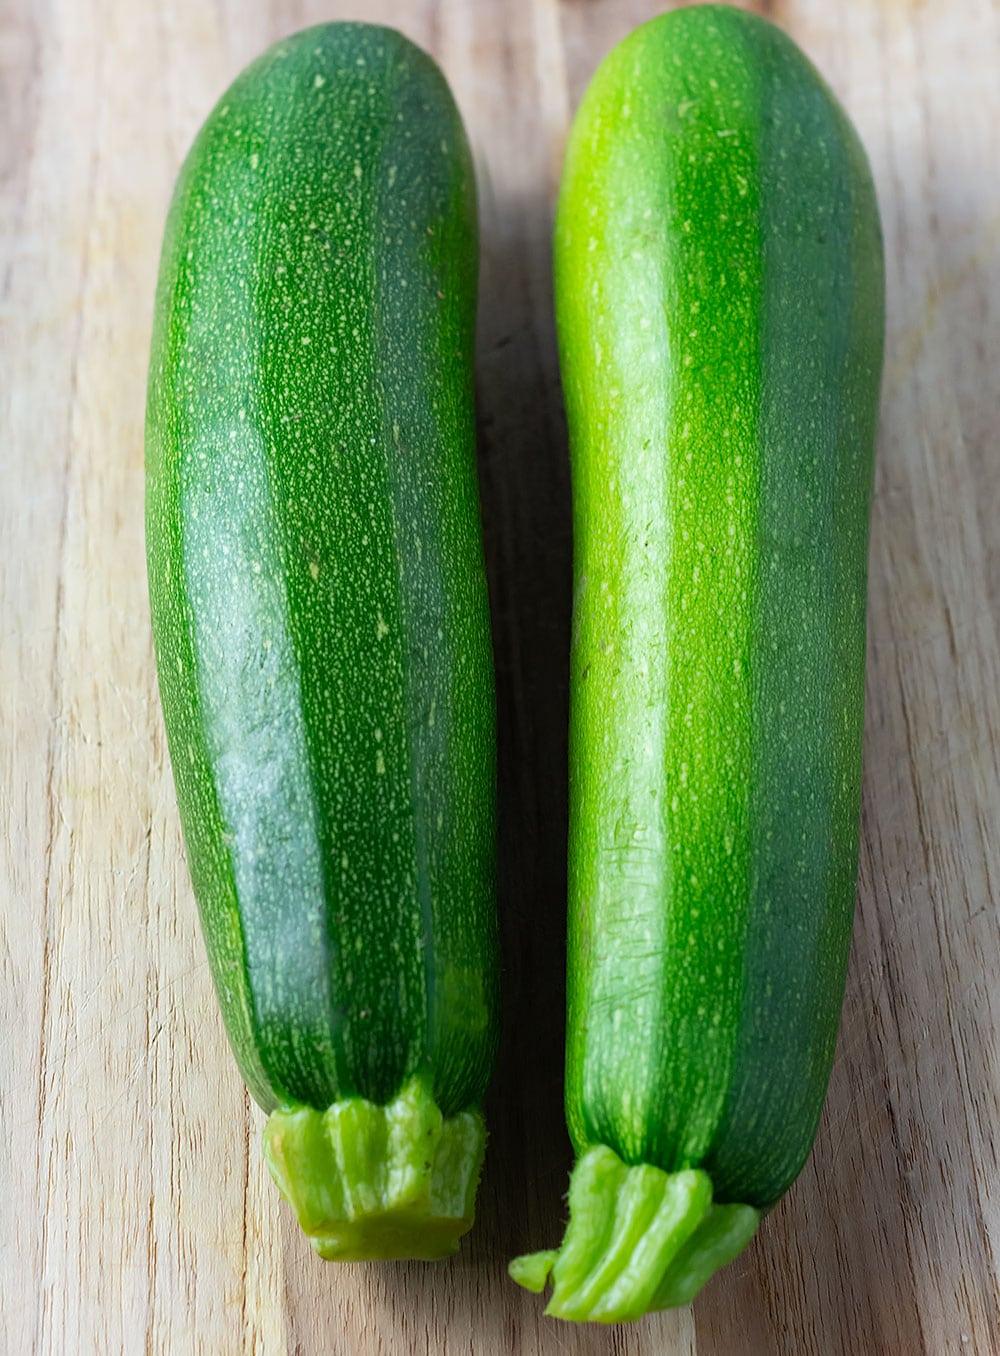 zucchini-for-zucchini-chips